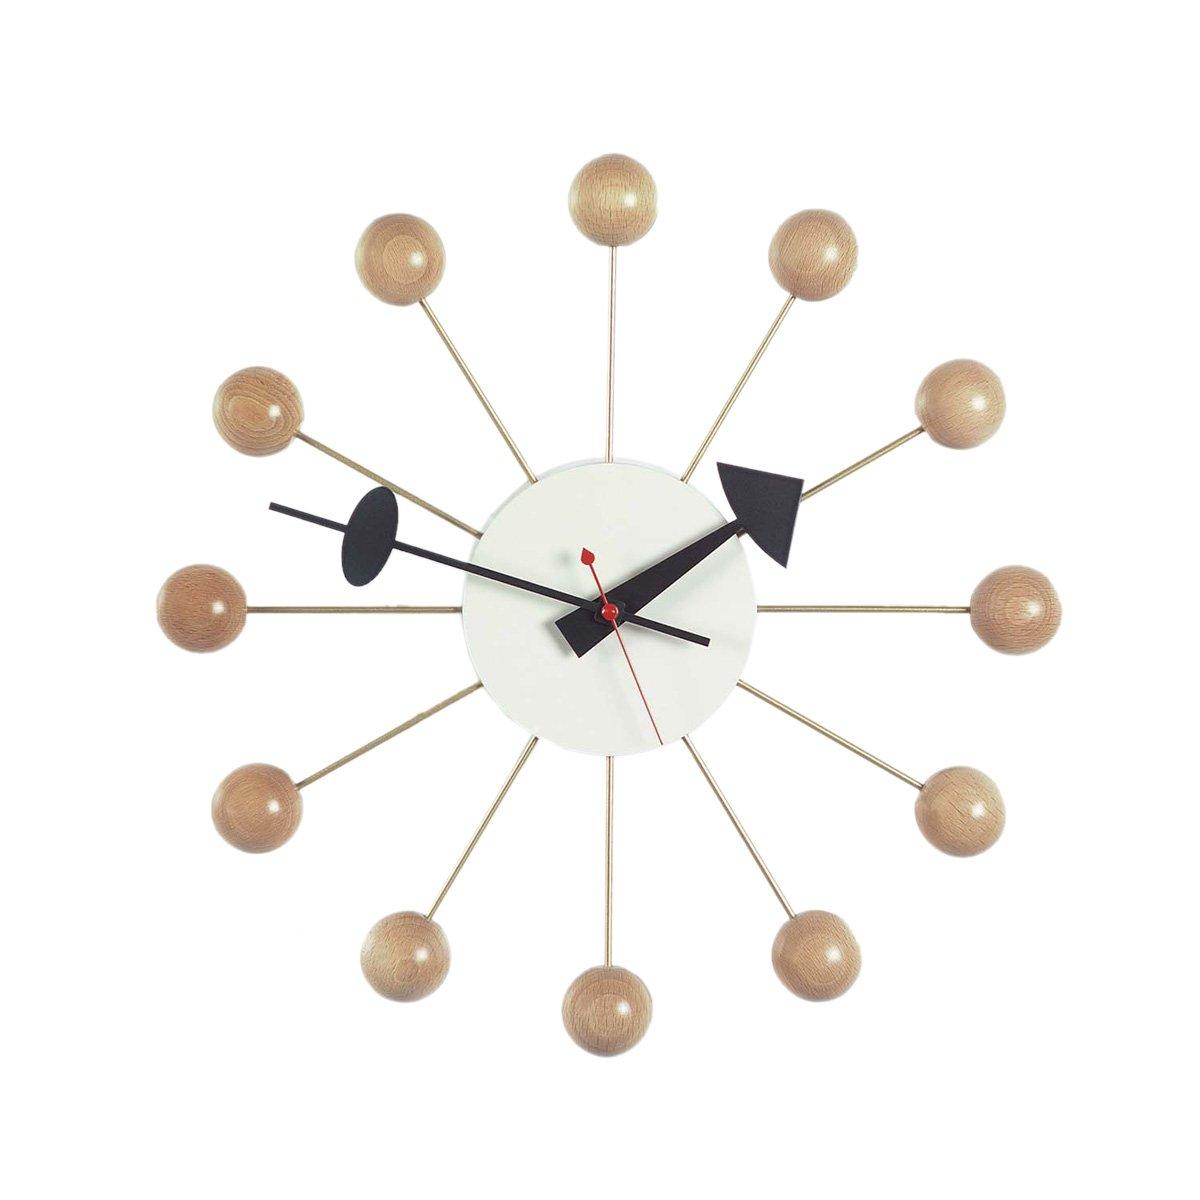 Vitra 20125003 Wanduhr Ball Clock 330 mm mehrfarbig mehrfarbig mehrfarbig 3dd7f3